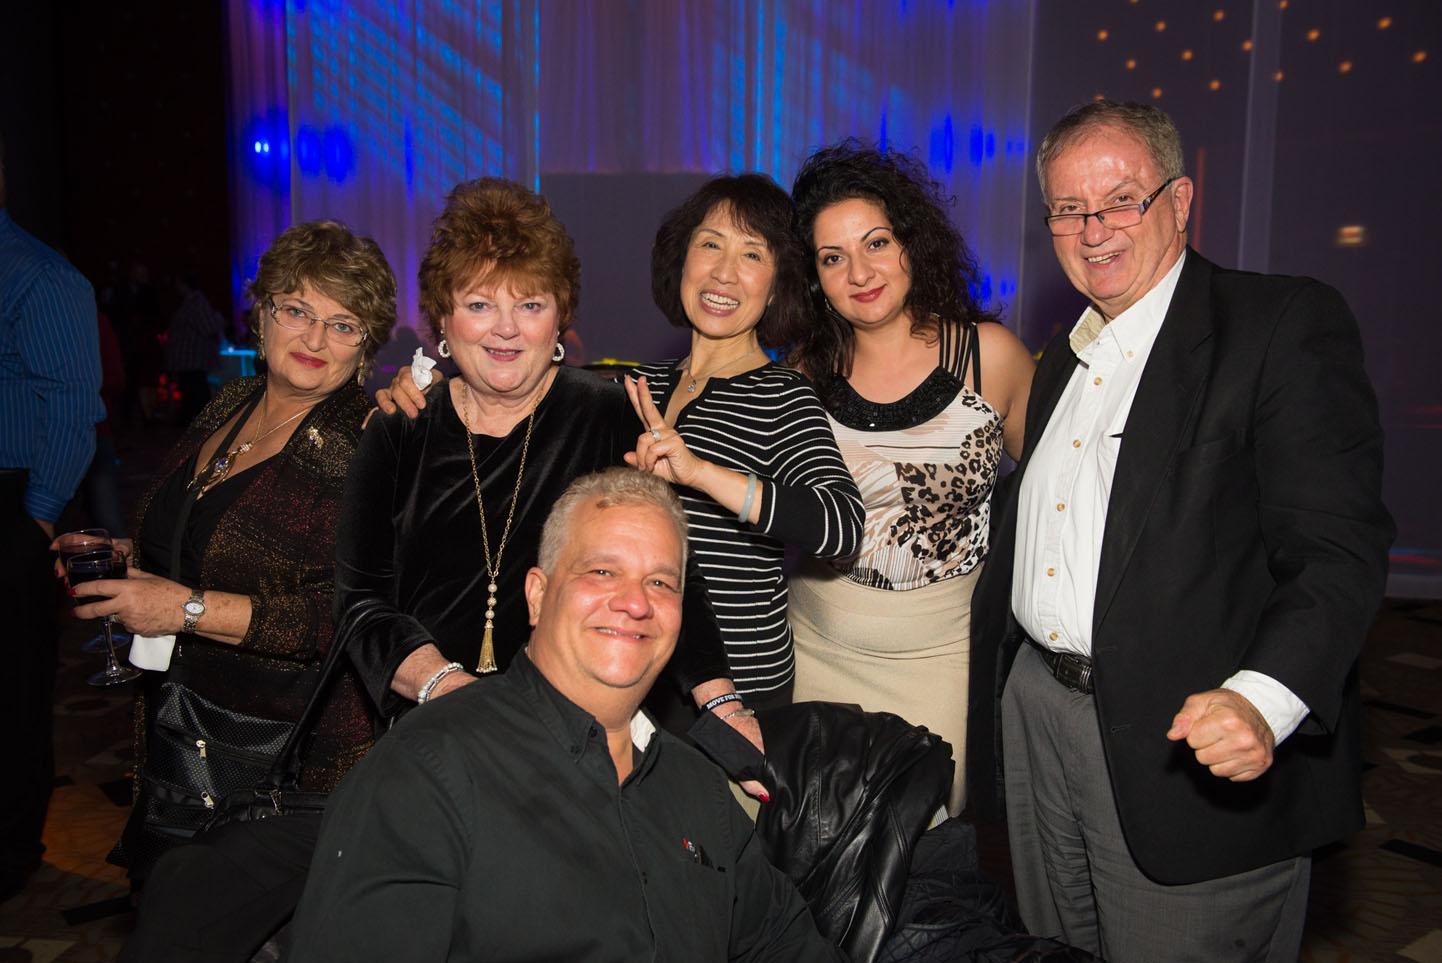 2015-12-09 ReMax Corpoarte Event - The Borgata - Atlantic City NJ - Photo Sesh - 2015-5068.jpg